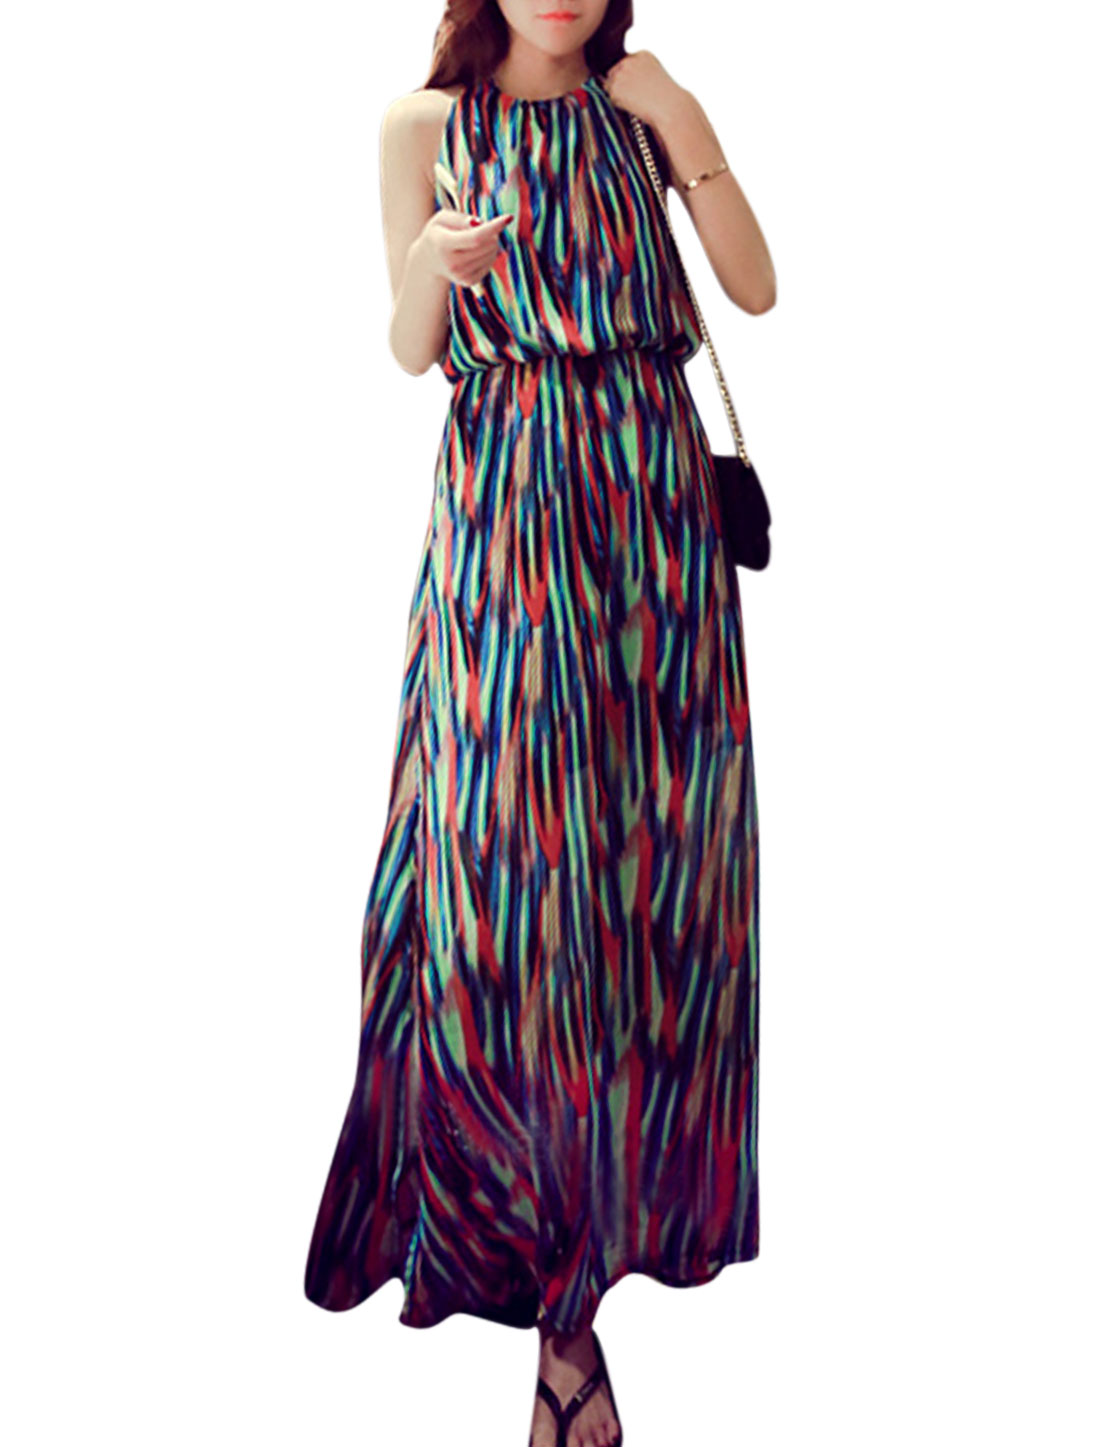 Women Sleeveless Round Neck Novelty Print Maxi Dress Royal Blue Red S